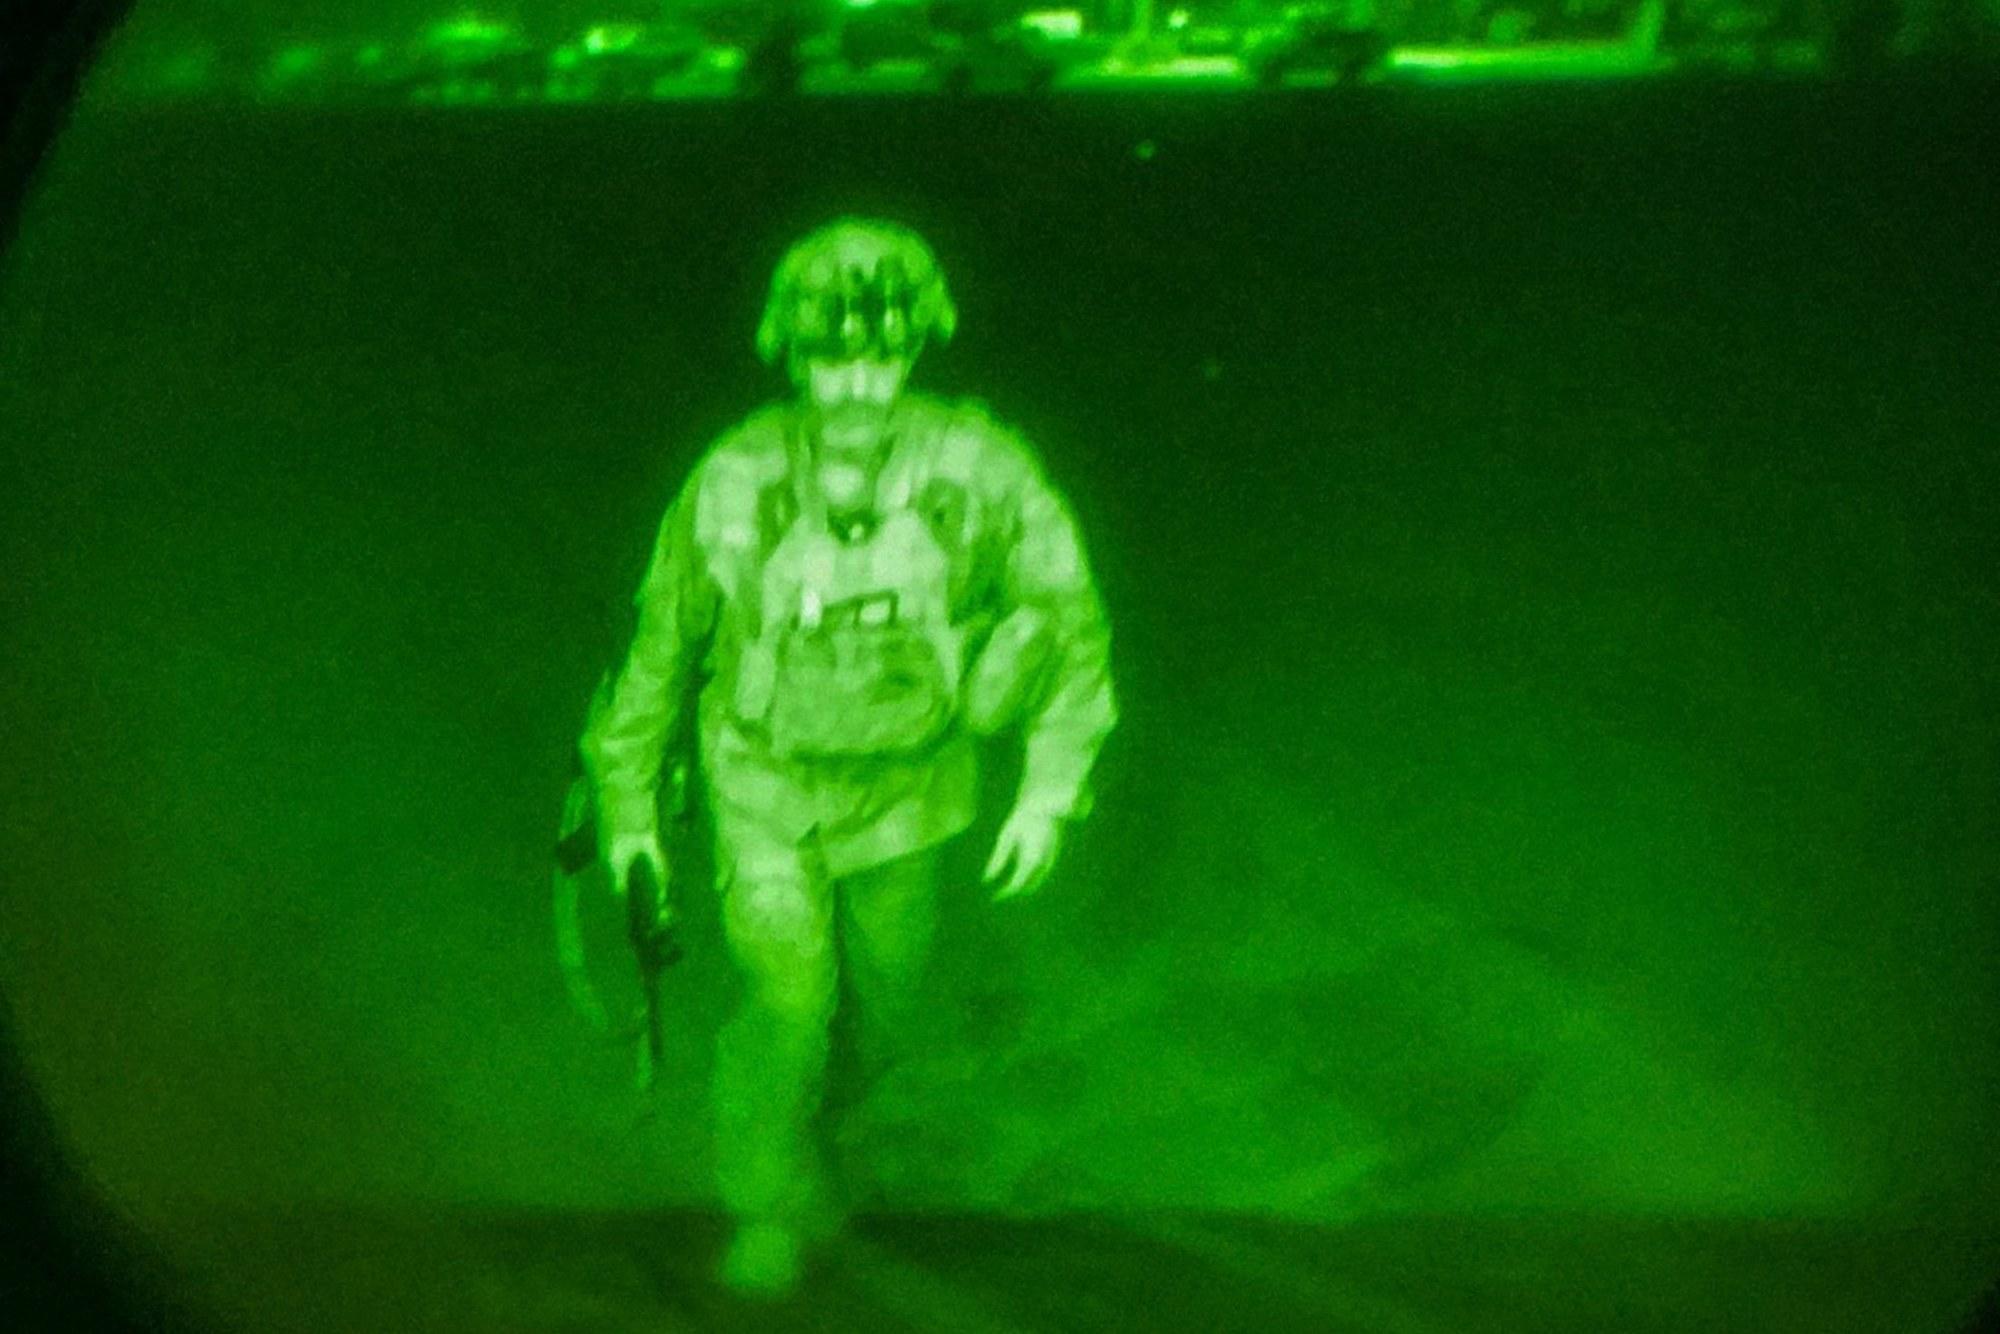 Армейский генерал - последний солдат США, покинувший Афганистан